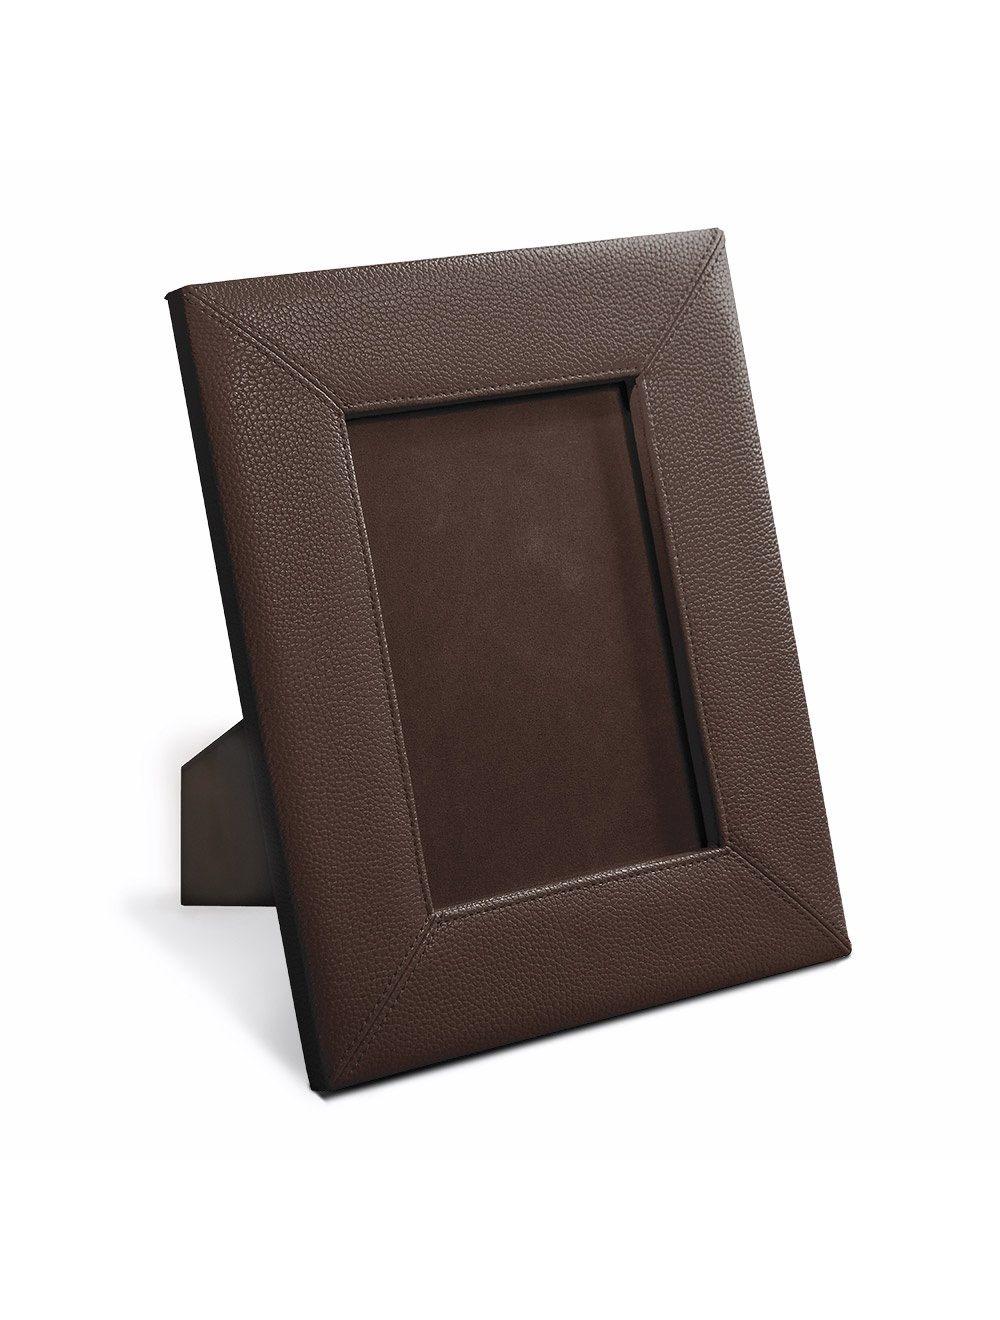 Photo Frame 13X18 Metal Plate - Brown